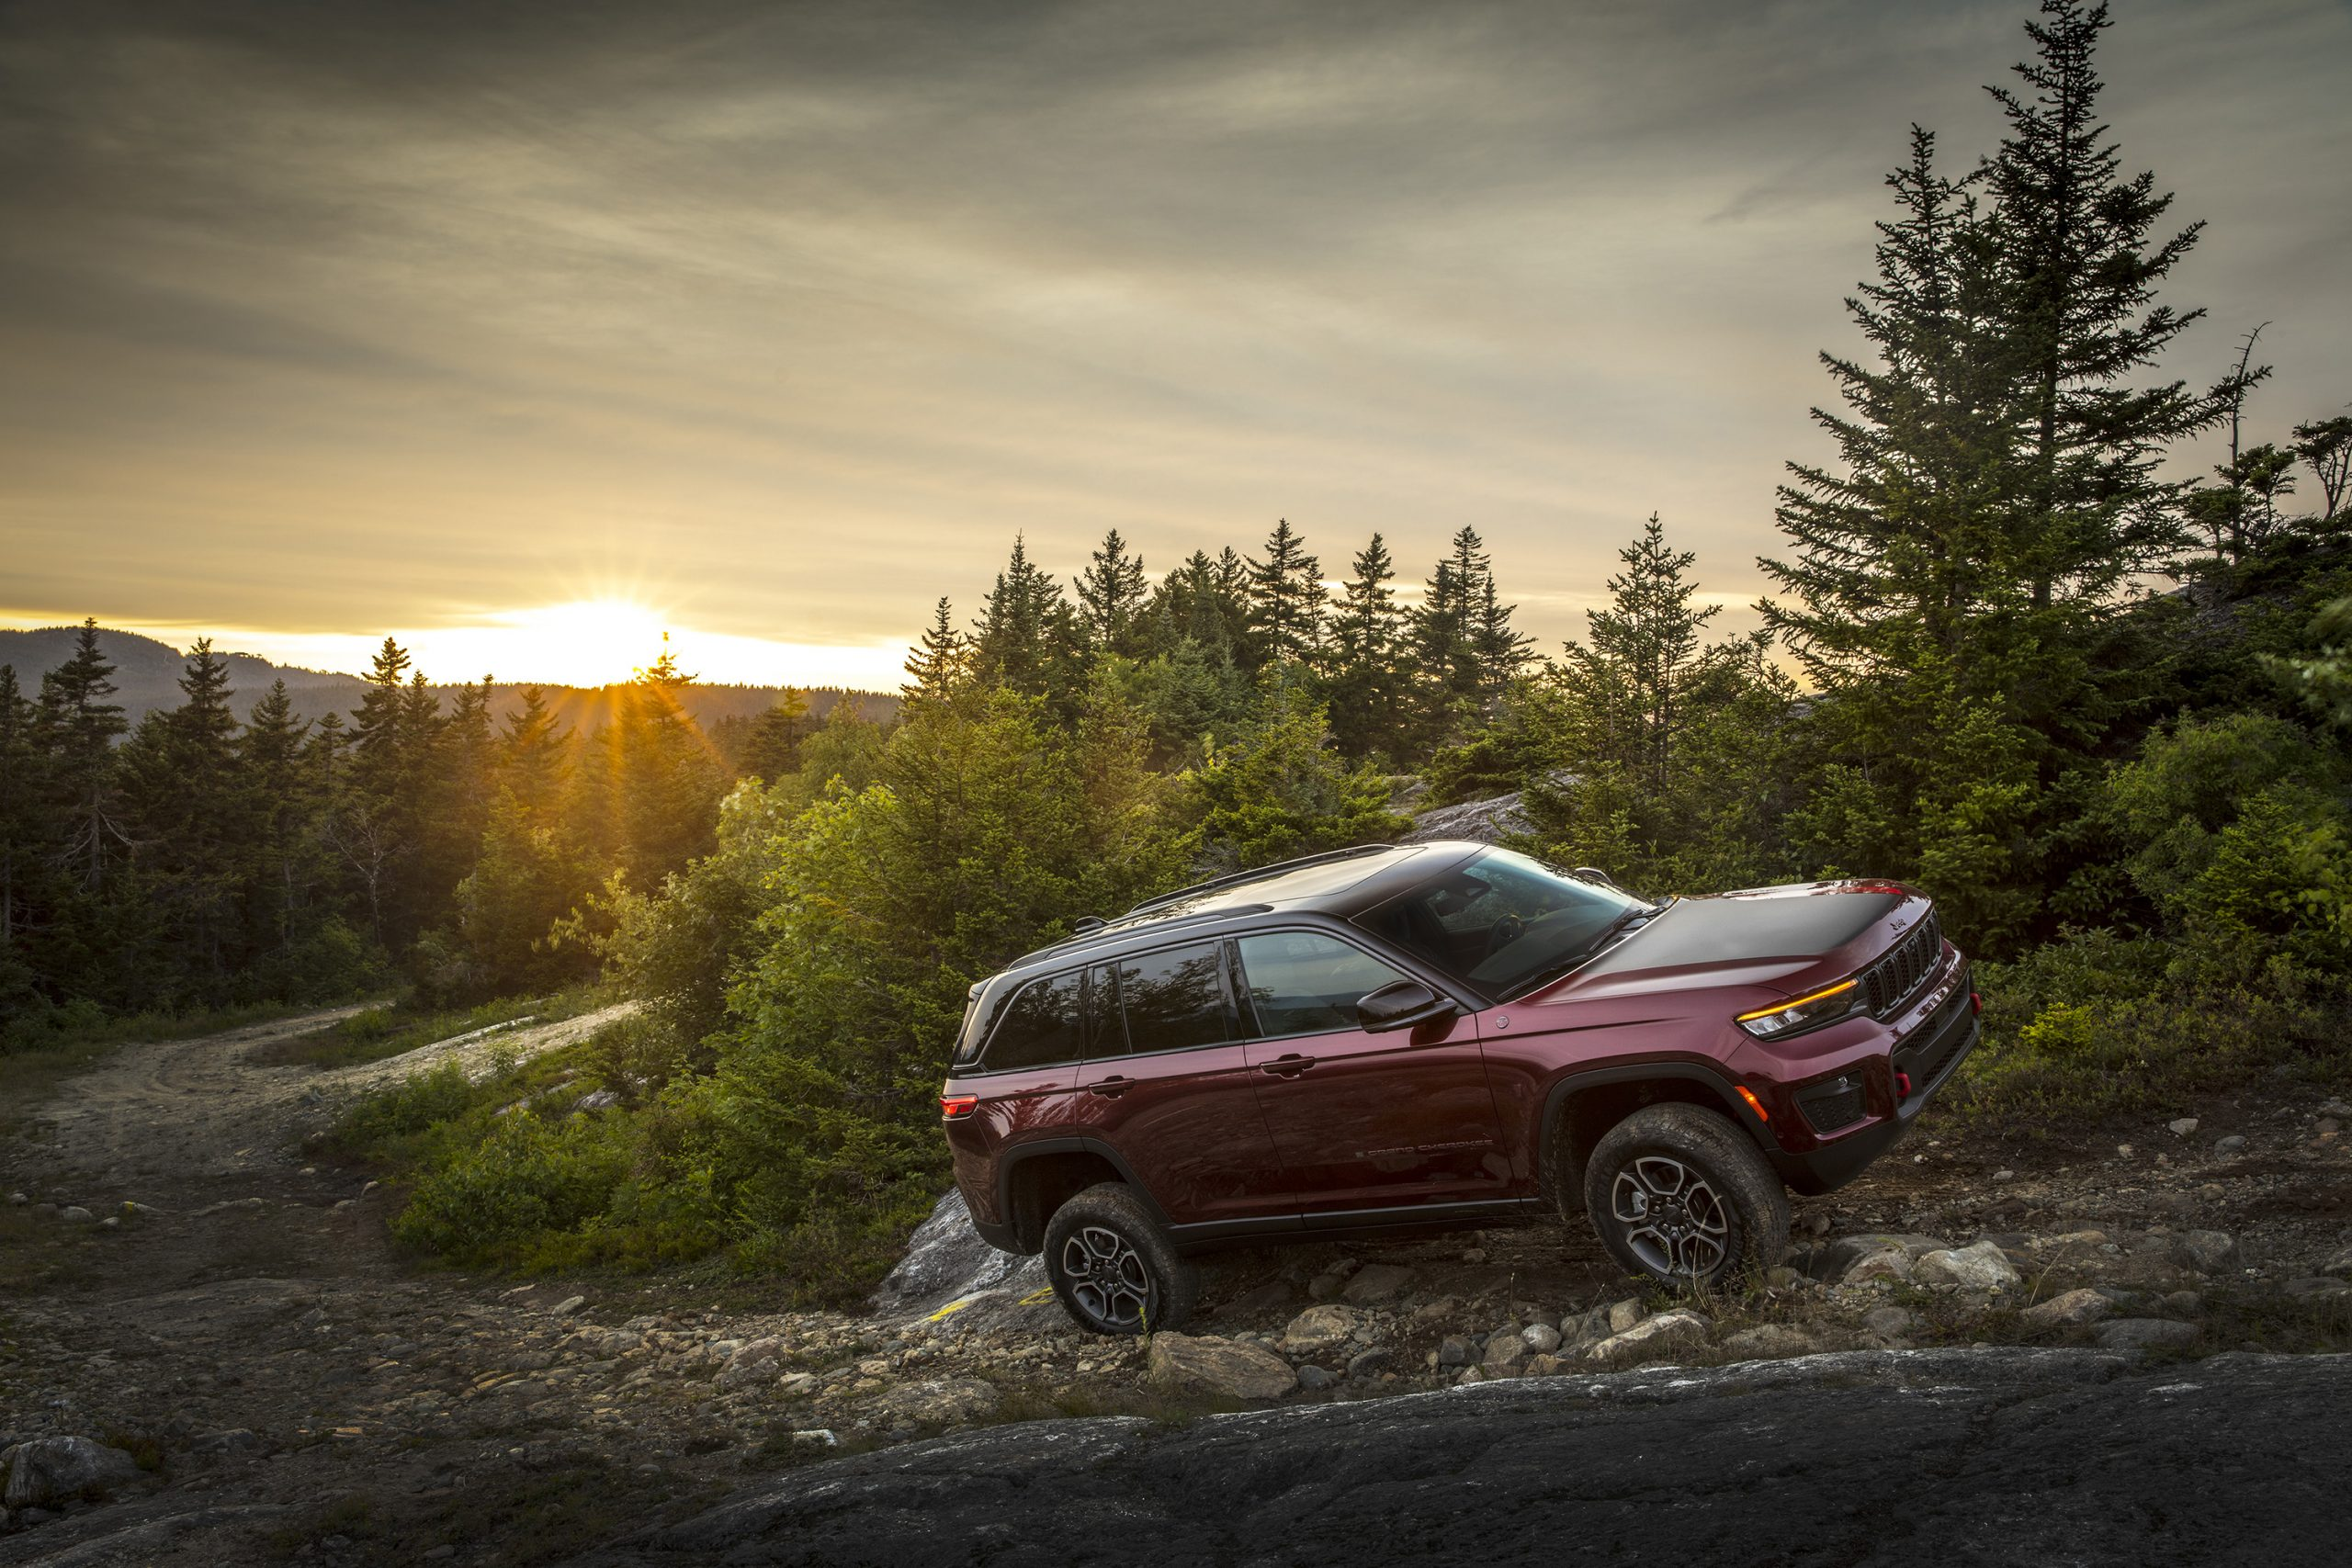 2022 Jeep Grand Cherokee Trailhawk side profile on mountain